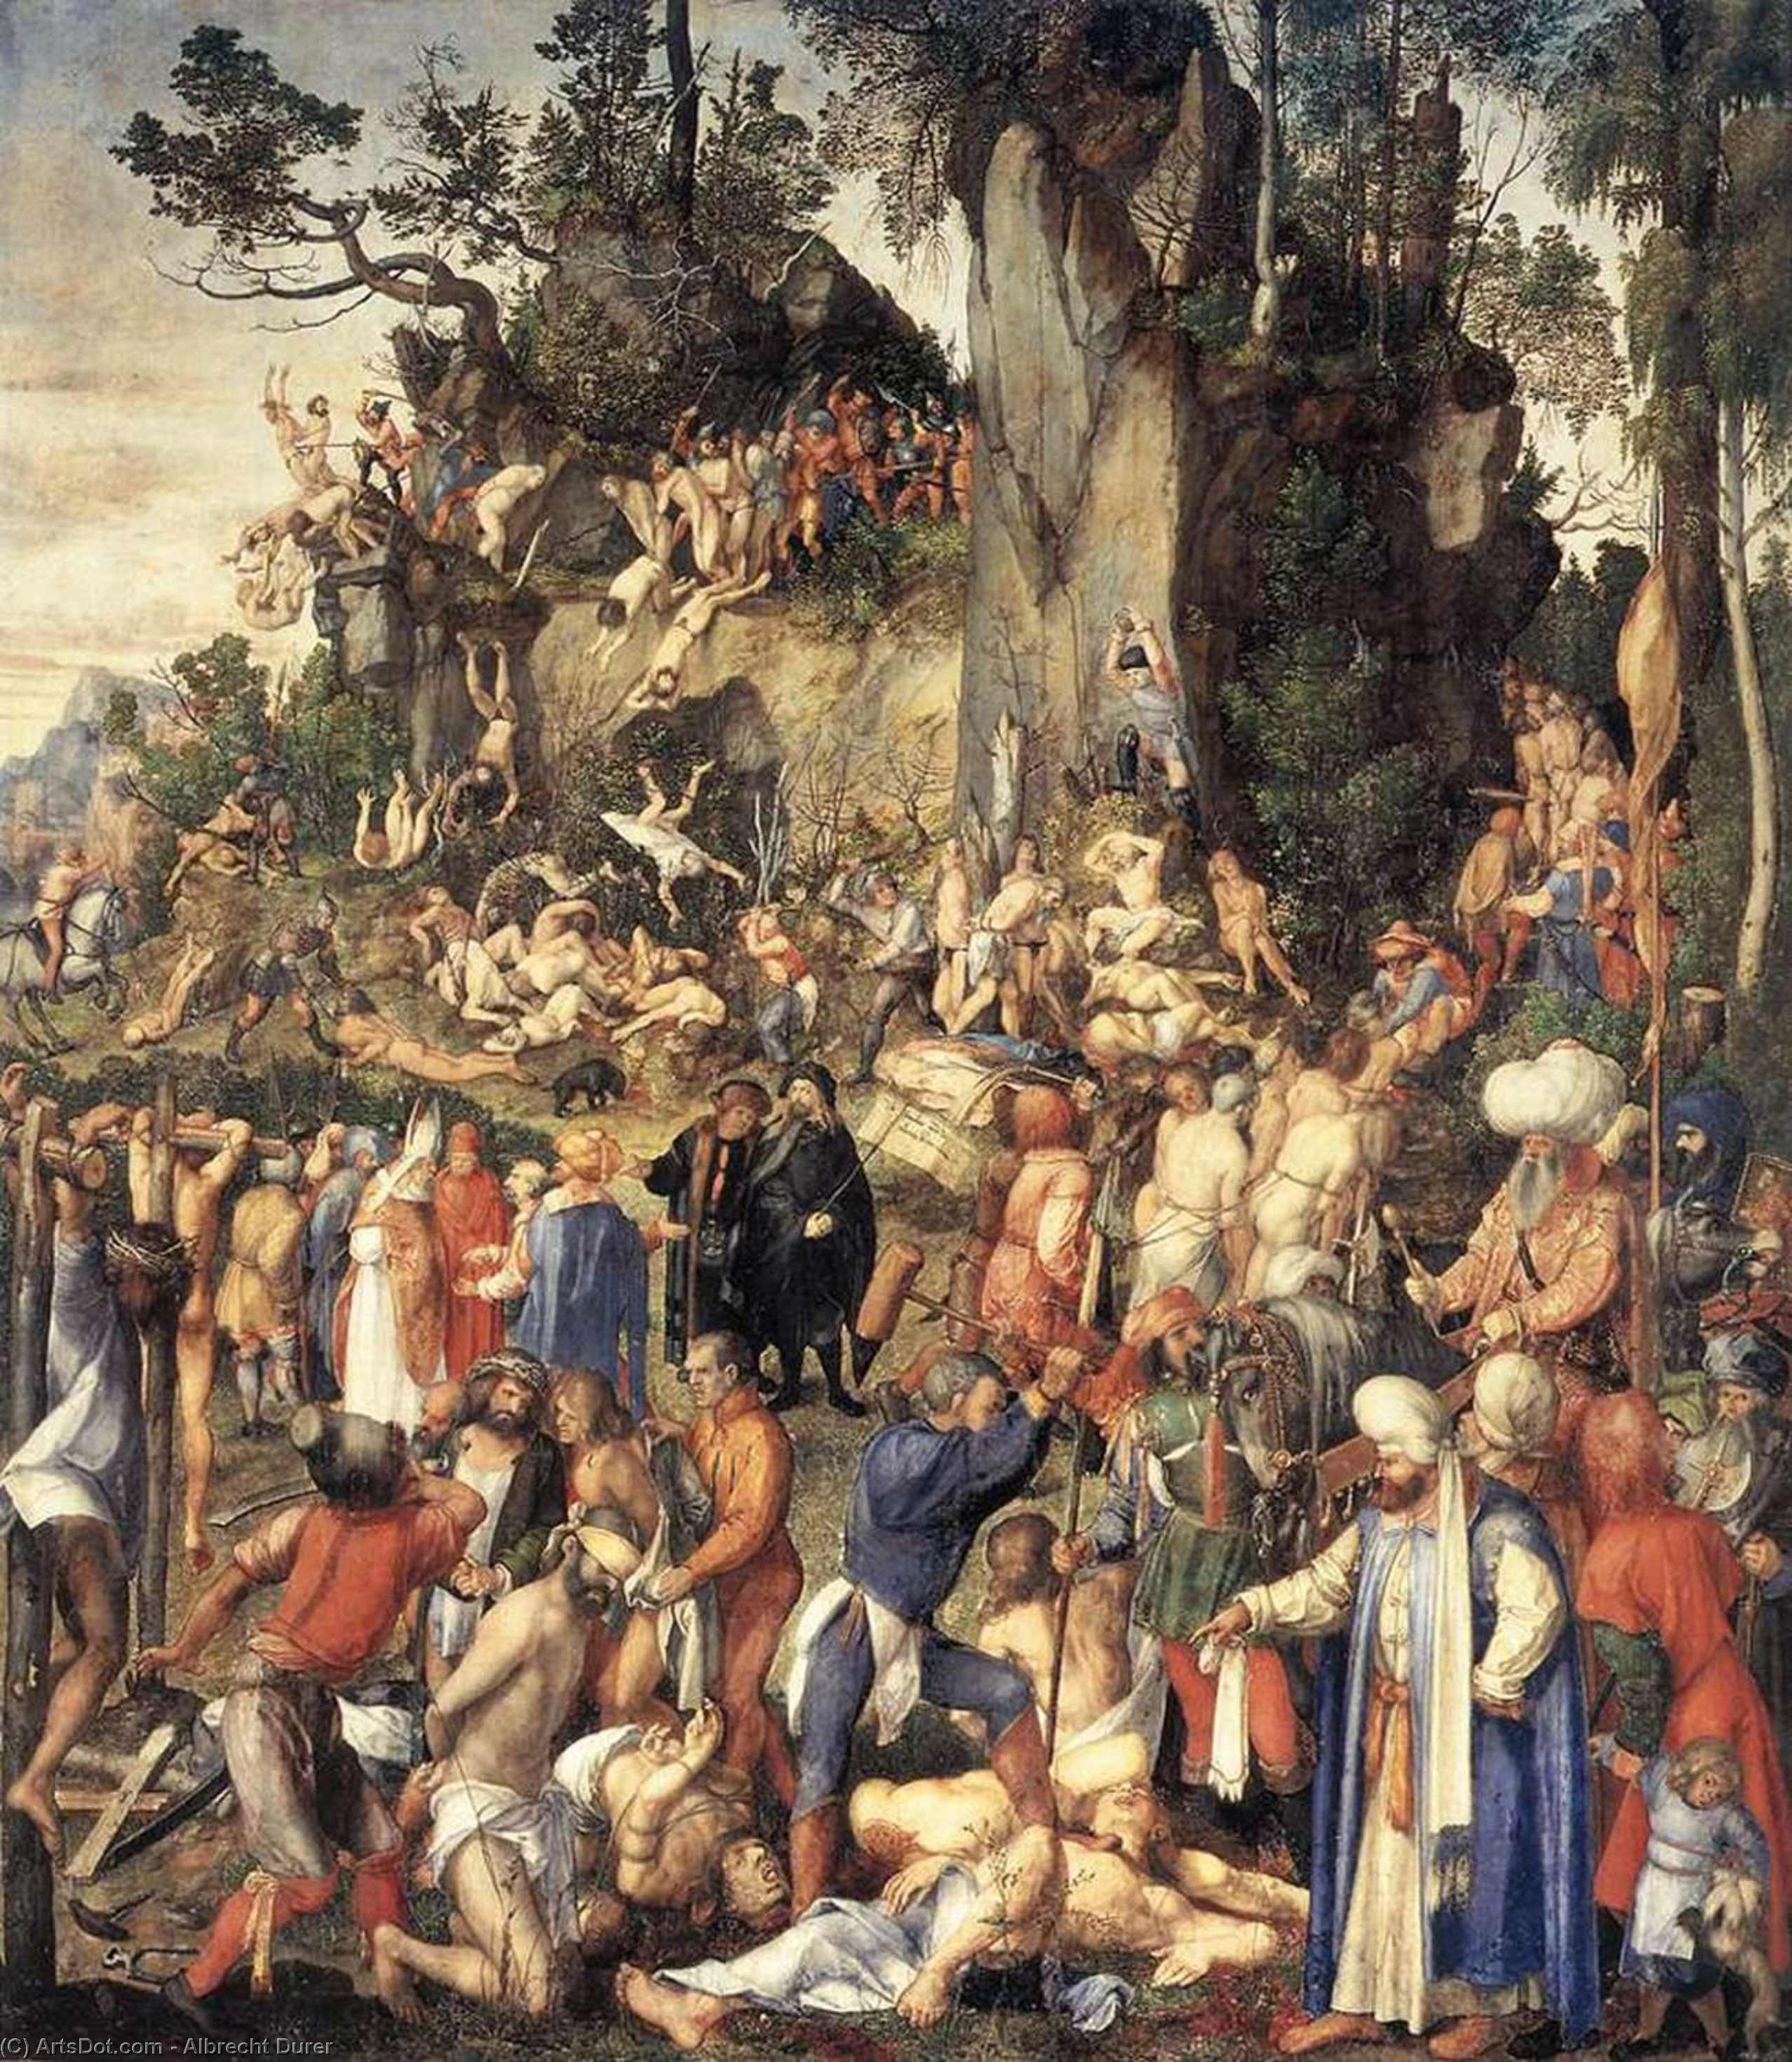 The Martyrdom of the Ten Thousand - Albrecht Durer